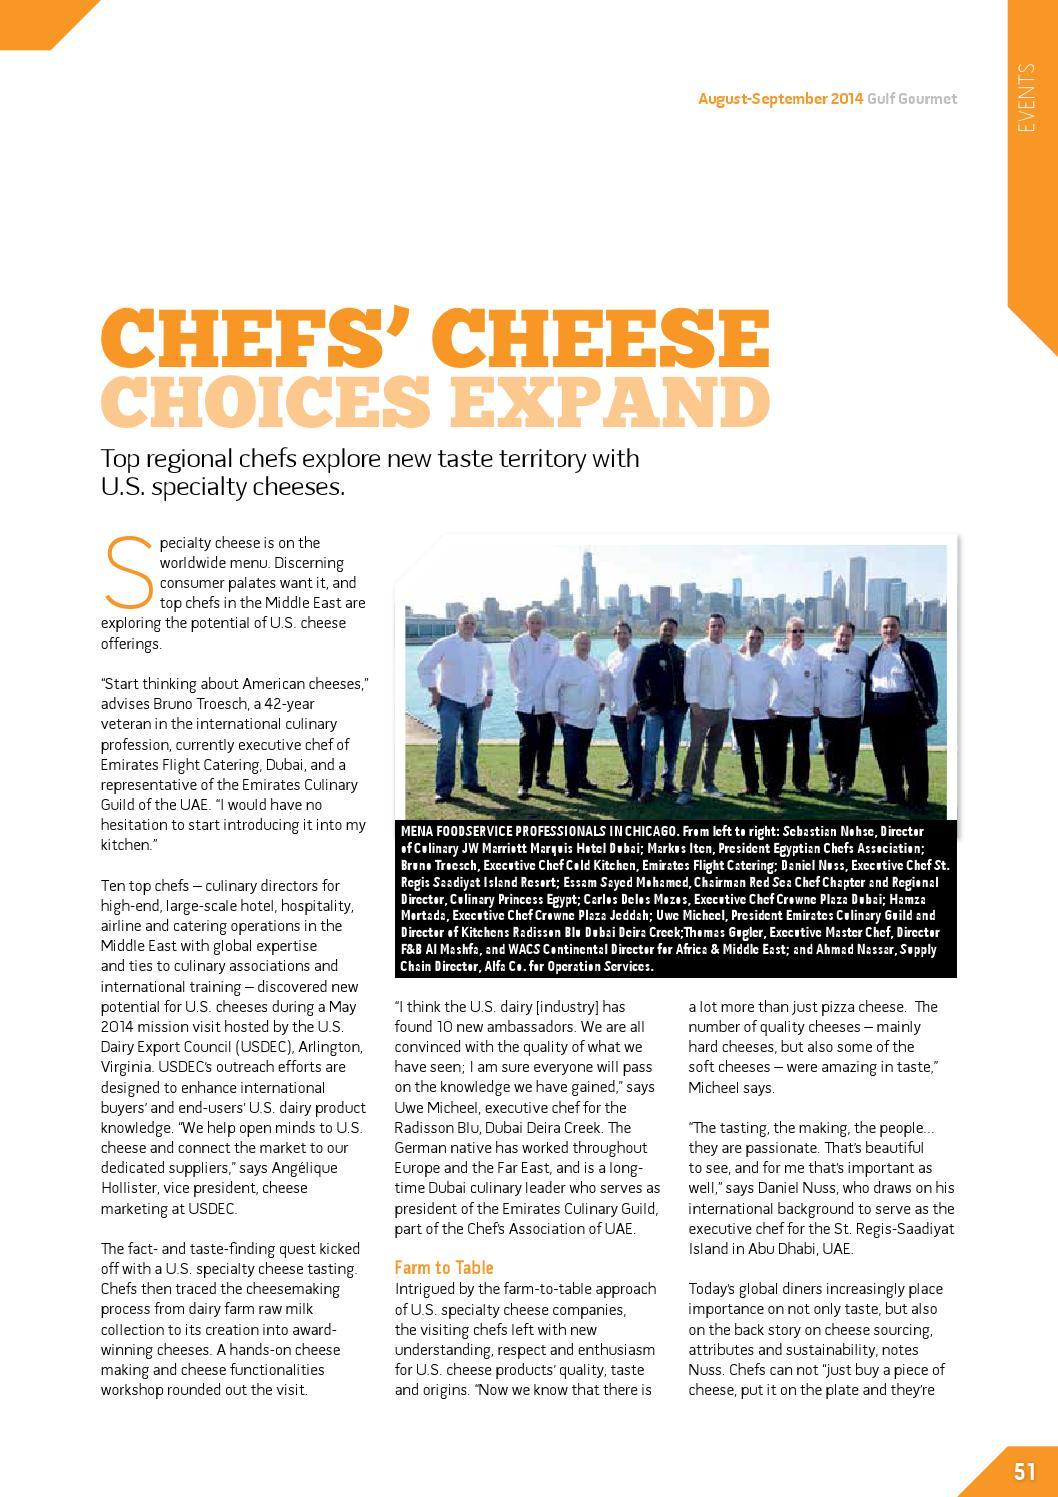 August-September 2014 by Gulf Gourmet magazine - issuu